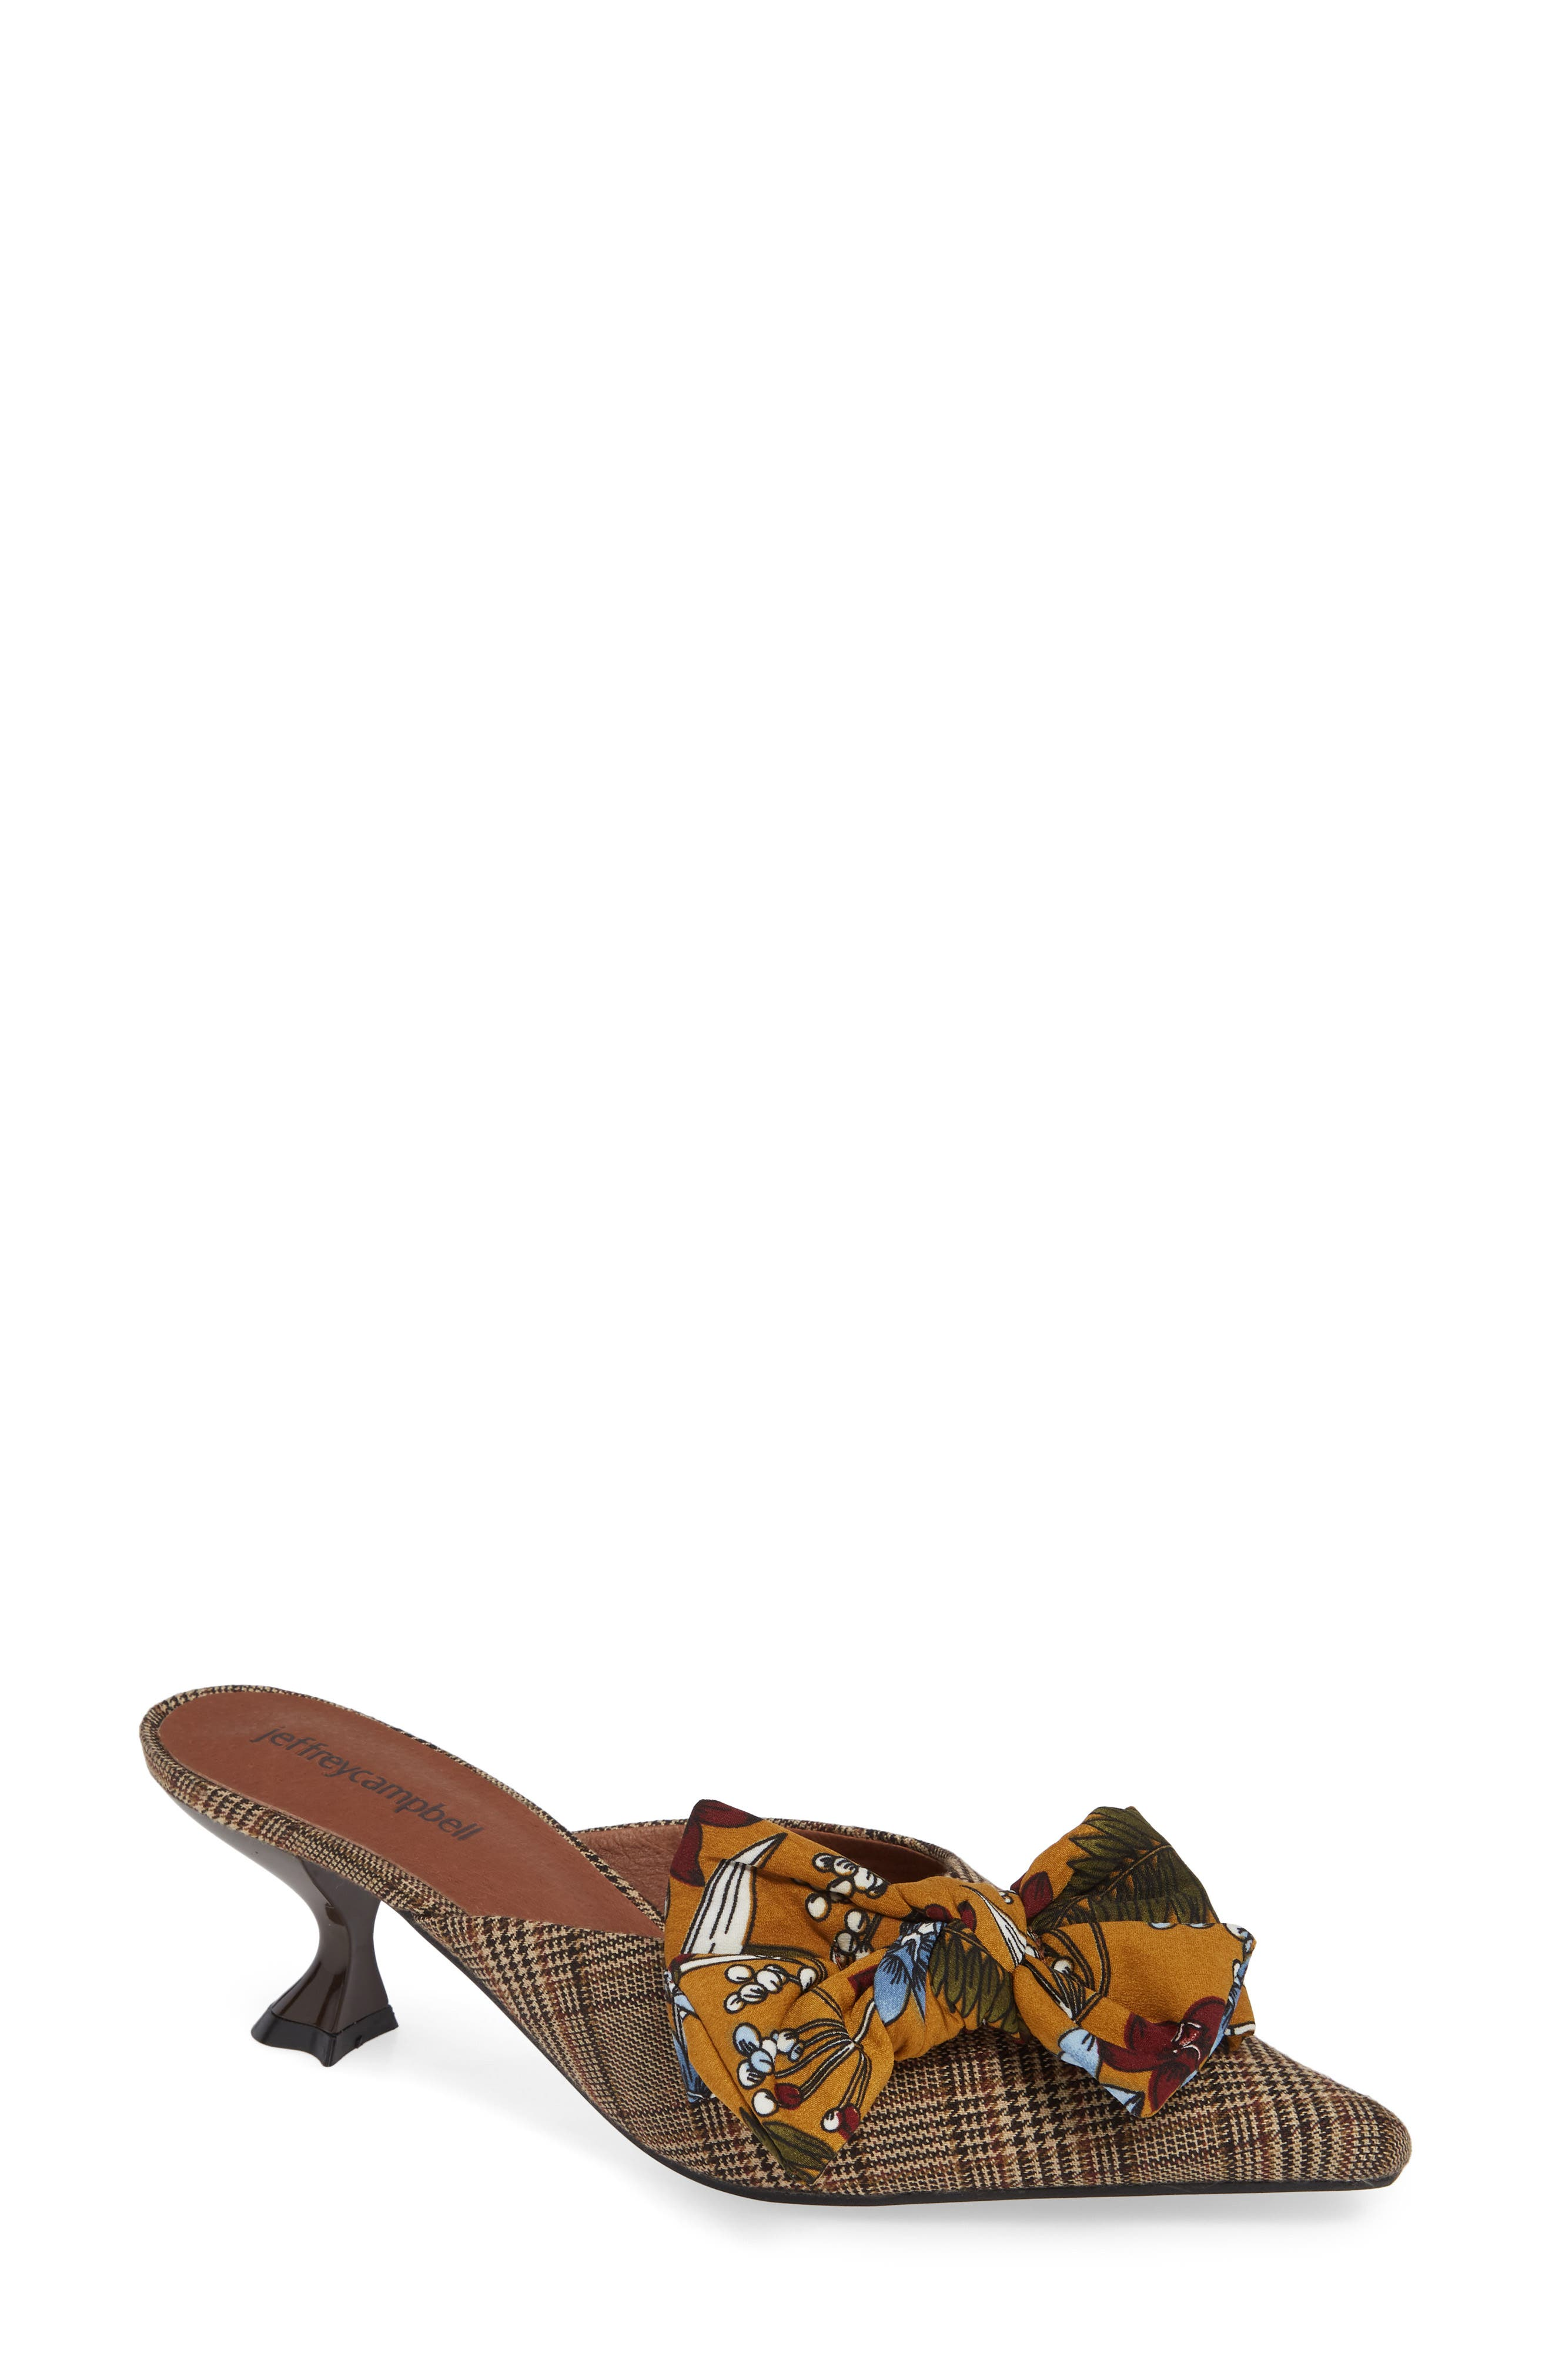 a694e4a3e8b Jeffrey Campbell Adorn Pointy Toe Mule